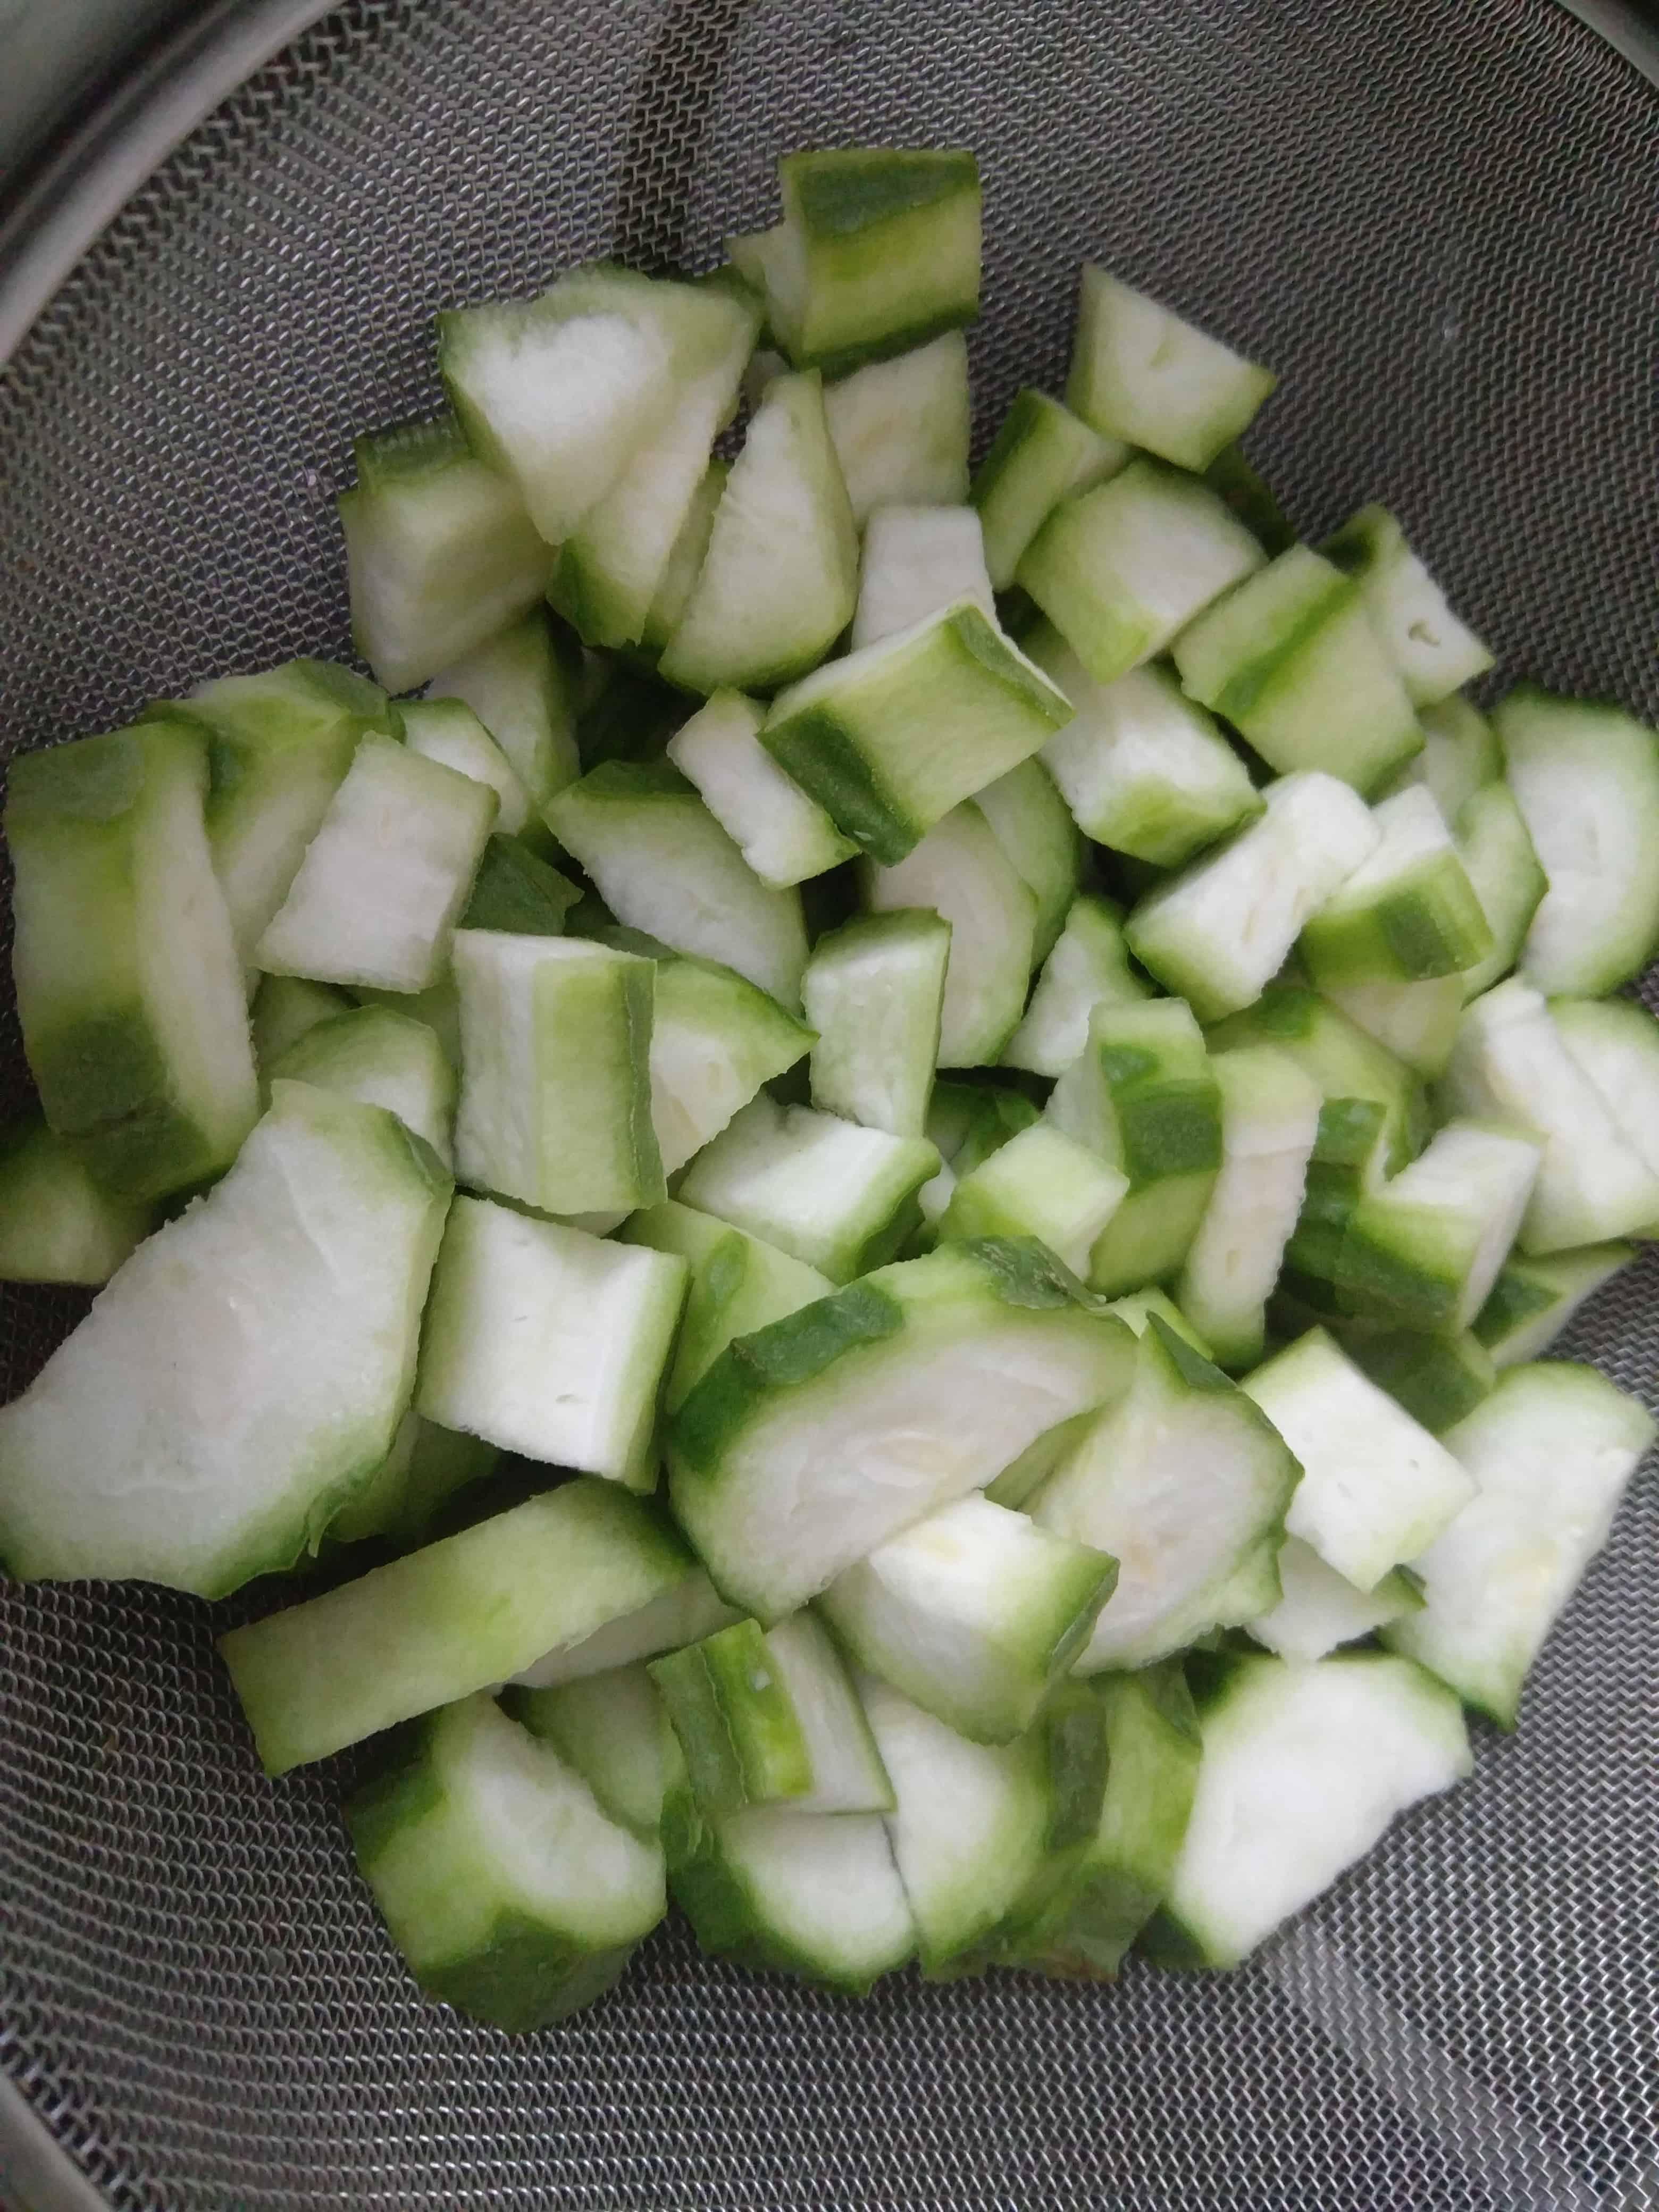 Turai Ki Sabzi Ridge Gourd Curry Masalachilli A Complete Vegetarian Food Experience